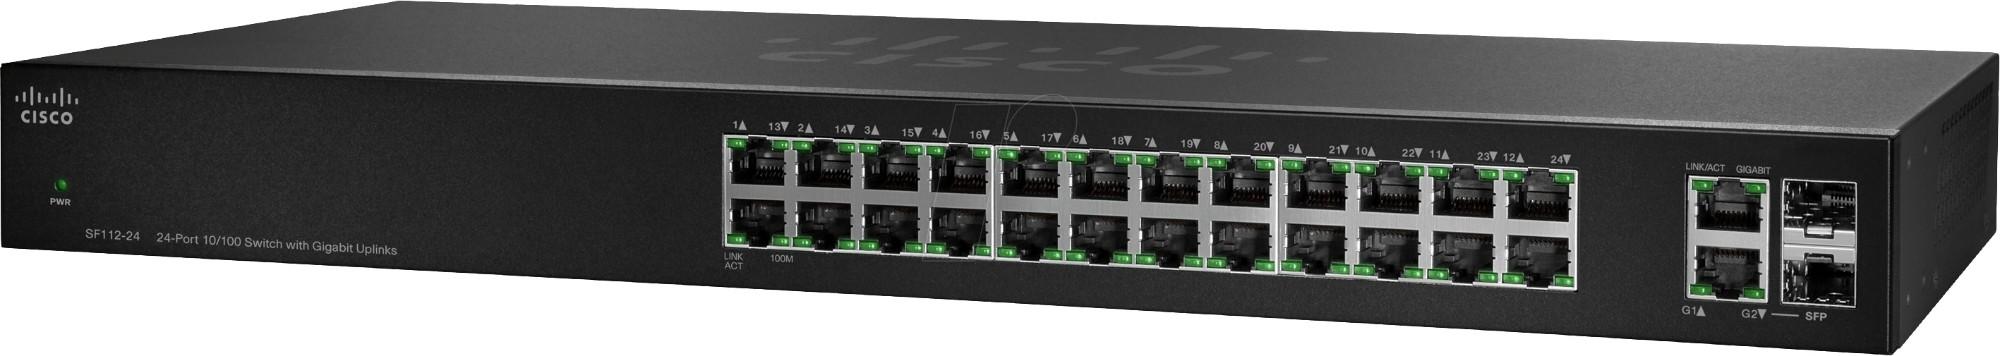 Cisco SF112-24 Unmanaged network switch L2 Fast Ethernet (10/100) 1U Black